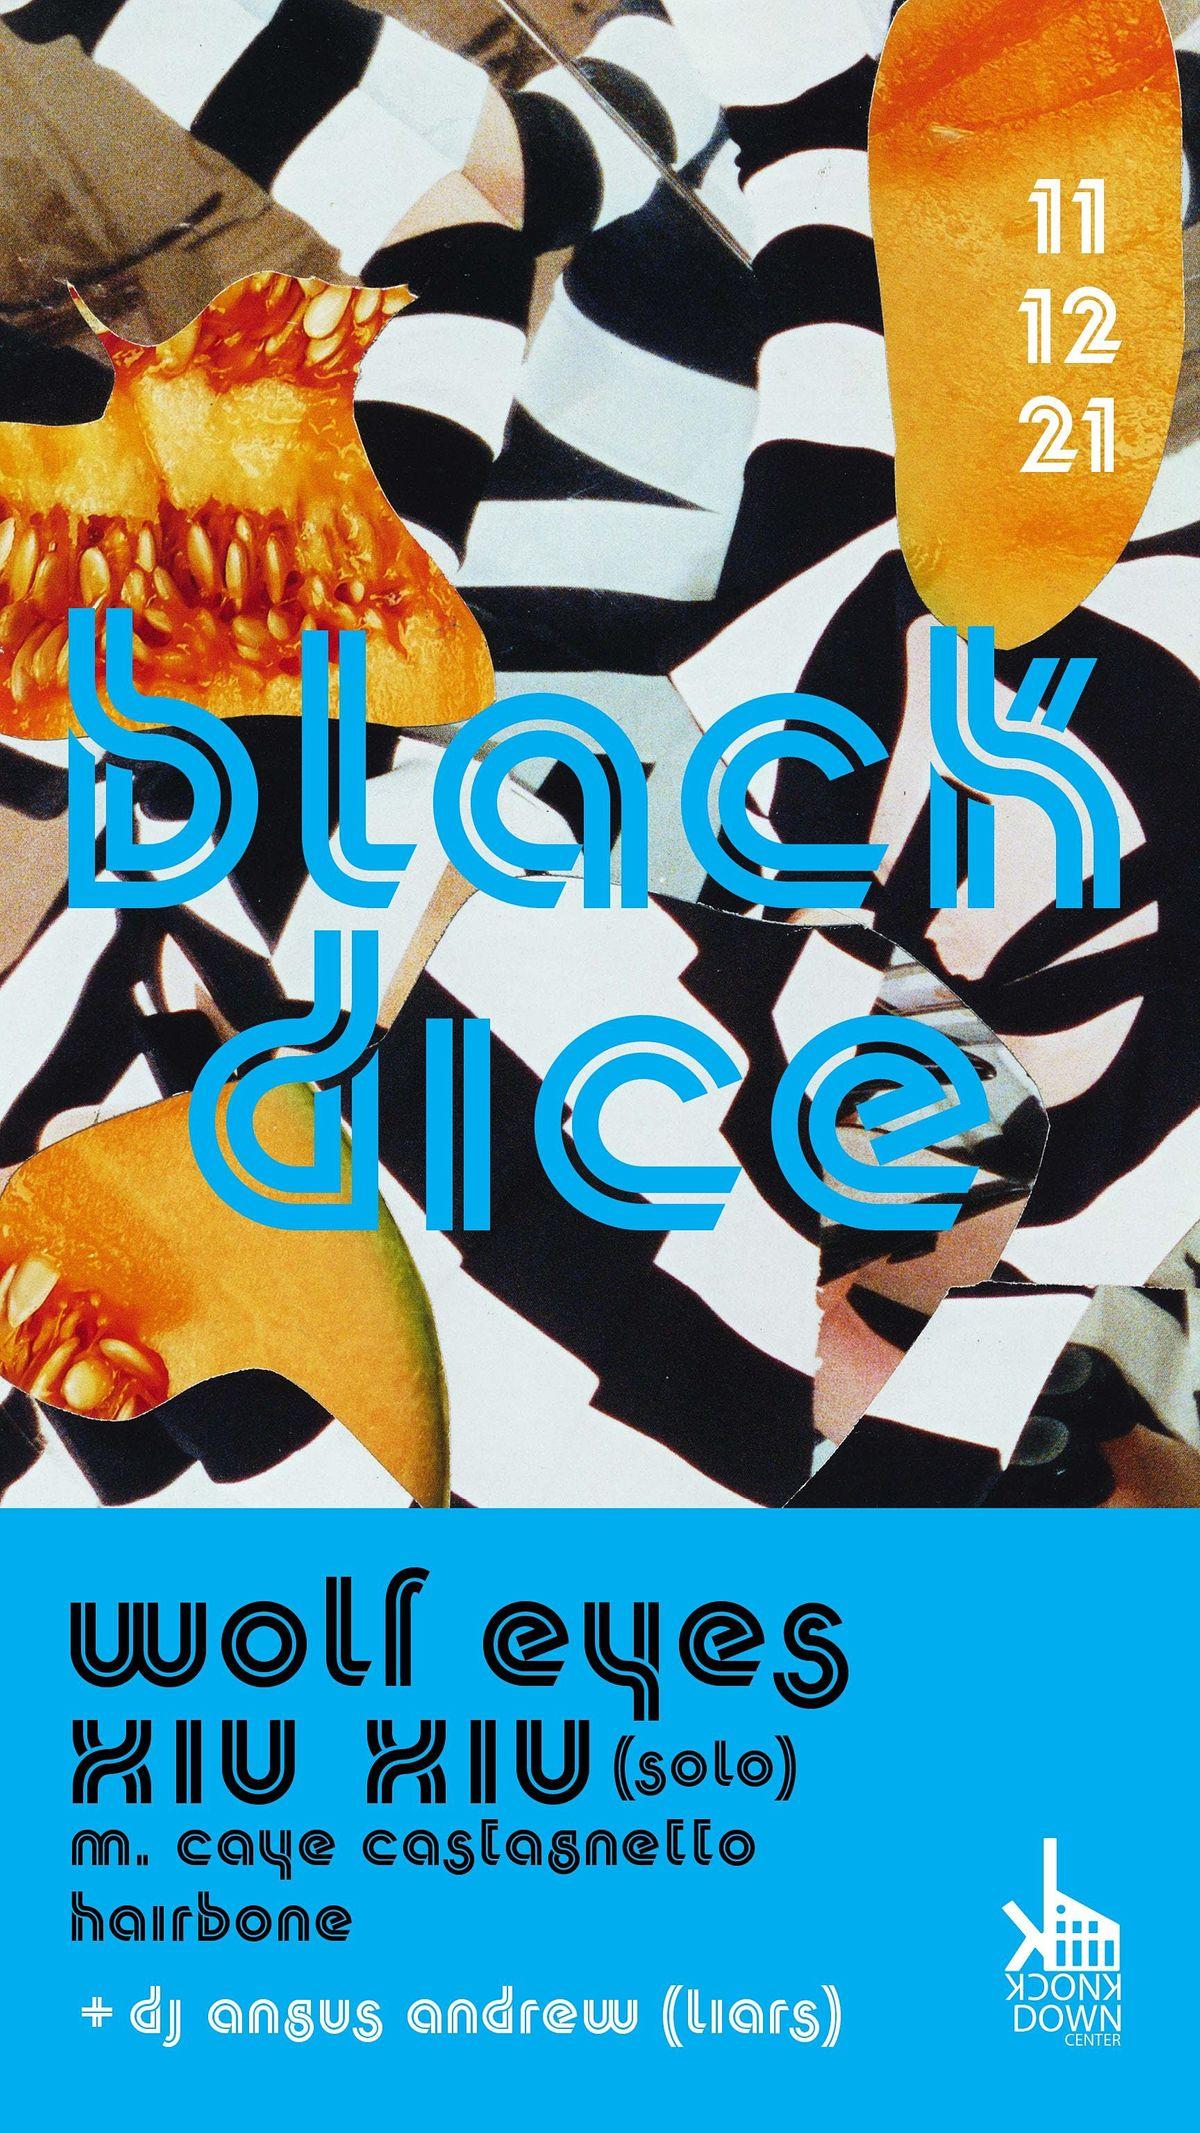 Black Dice / Wolf Eyes / Xiu Xiu (solo) / Liars (DJ), 12 November | Event in Queens | AllEvents.in